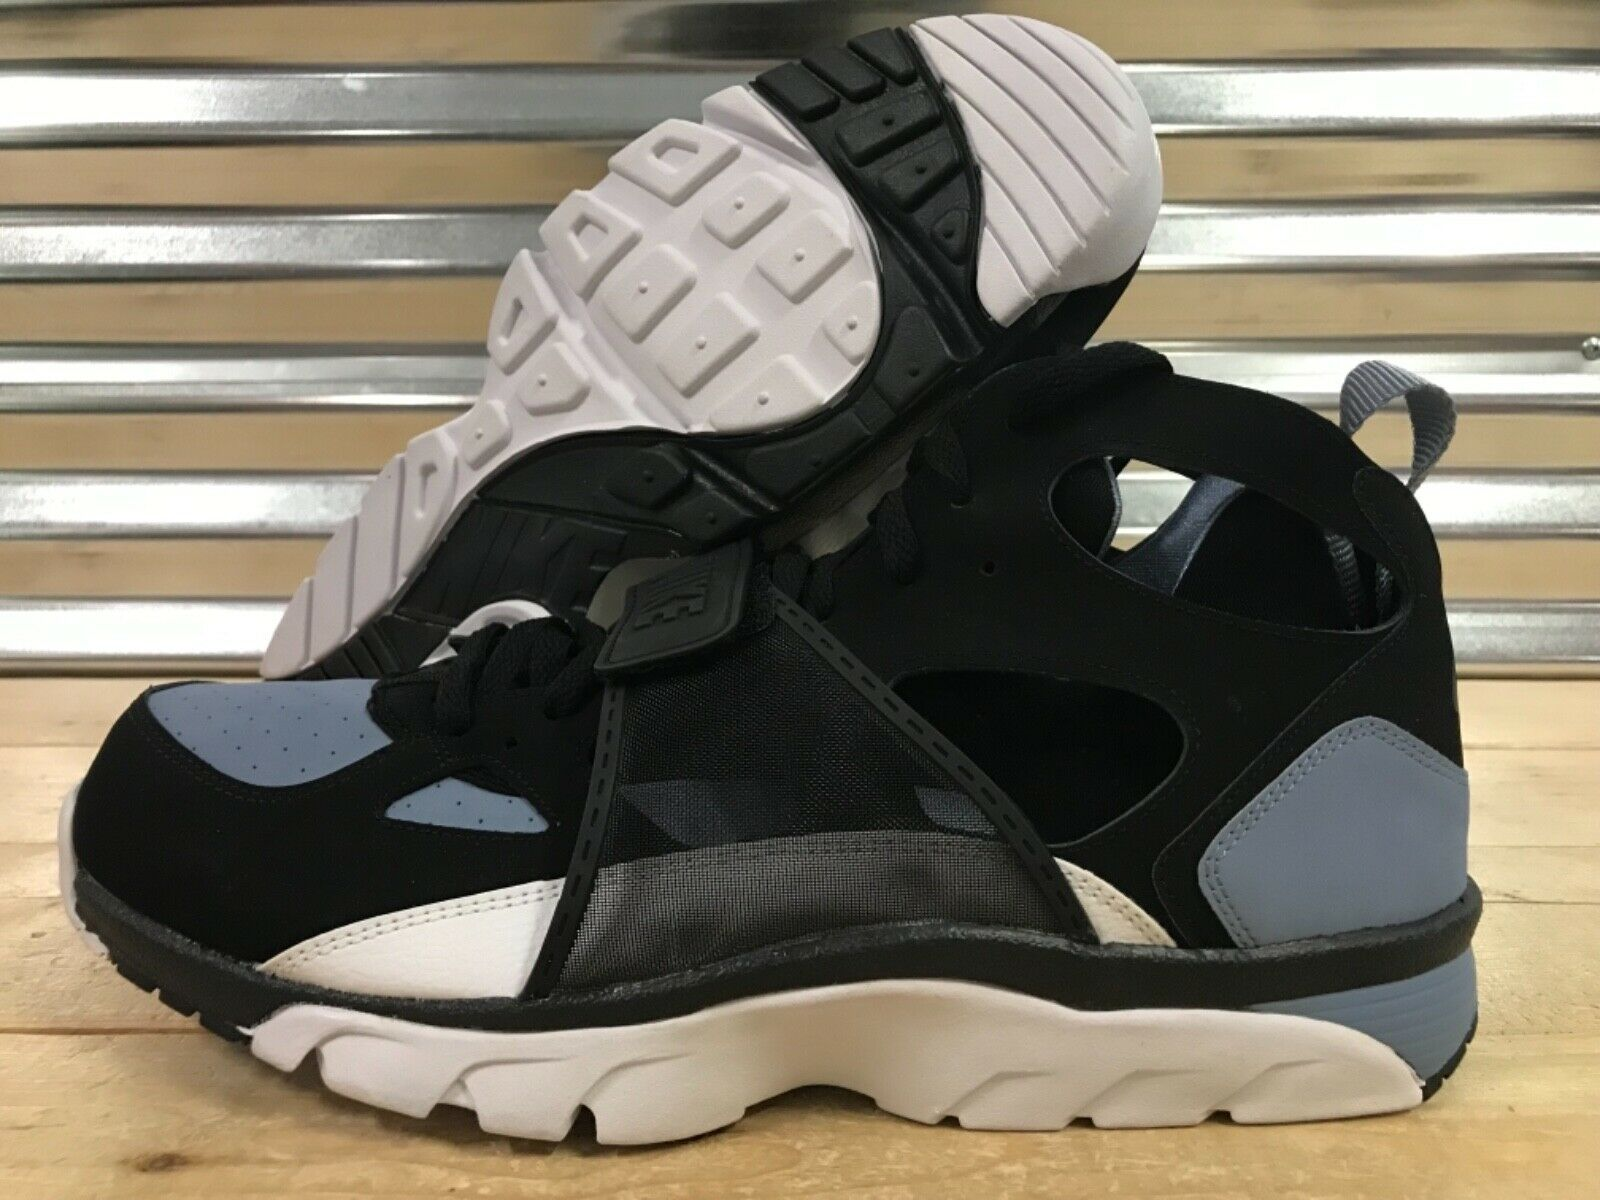 Nike Air Trainer Huarache Mid Running shoes Black Cool bluee SZ 15 ( 679083-016 )